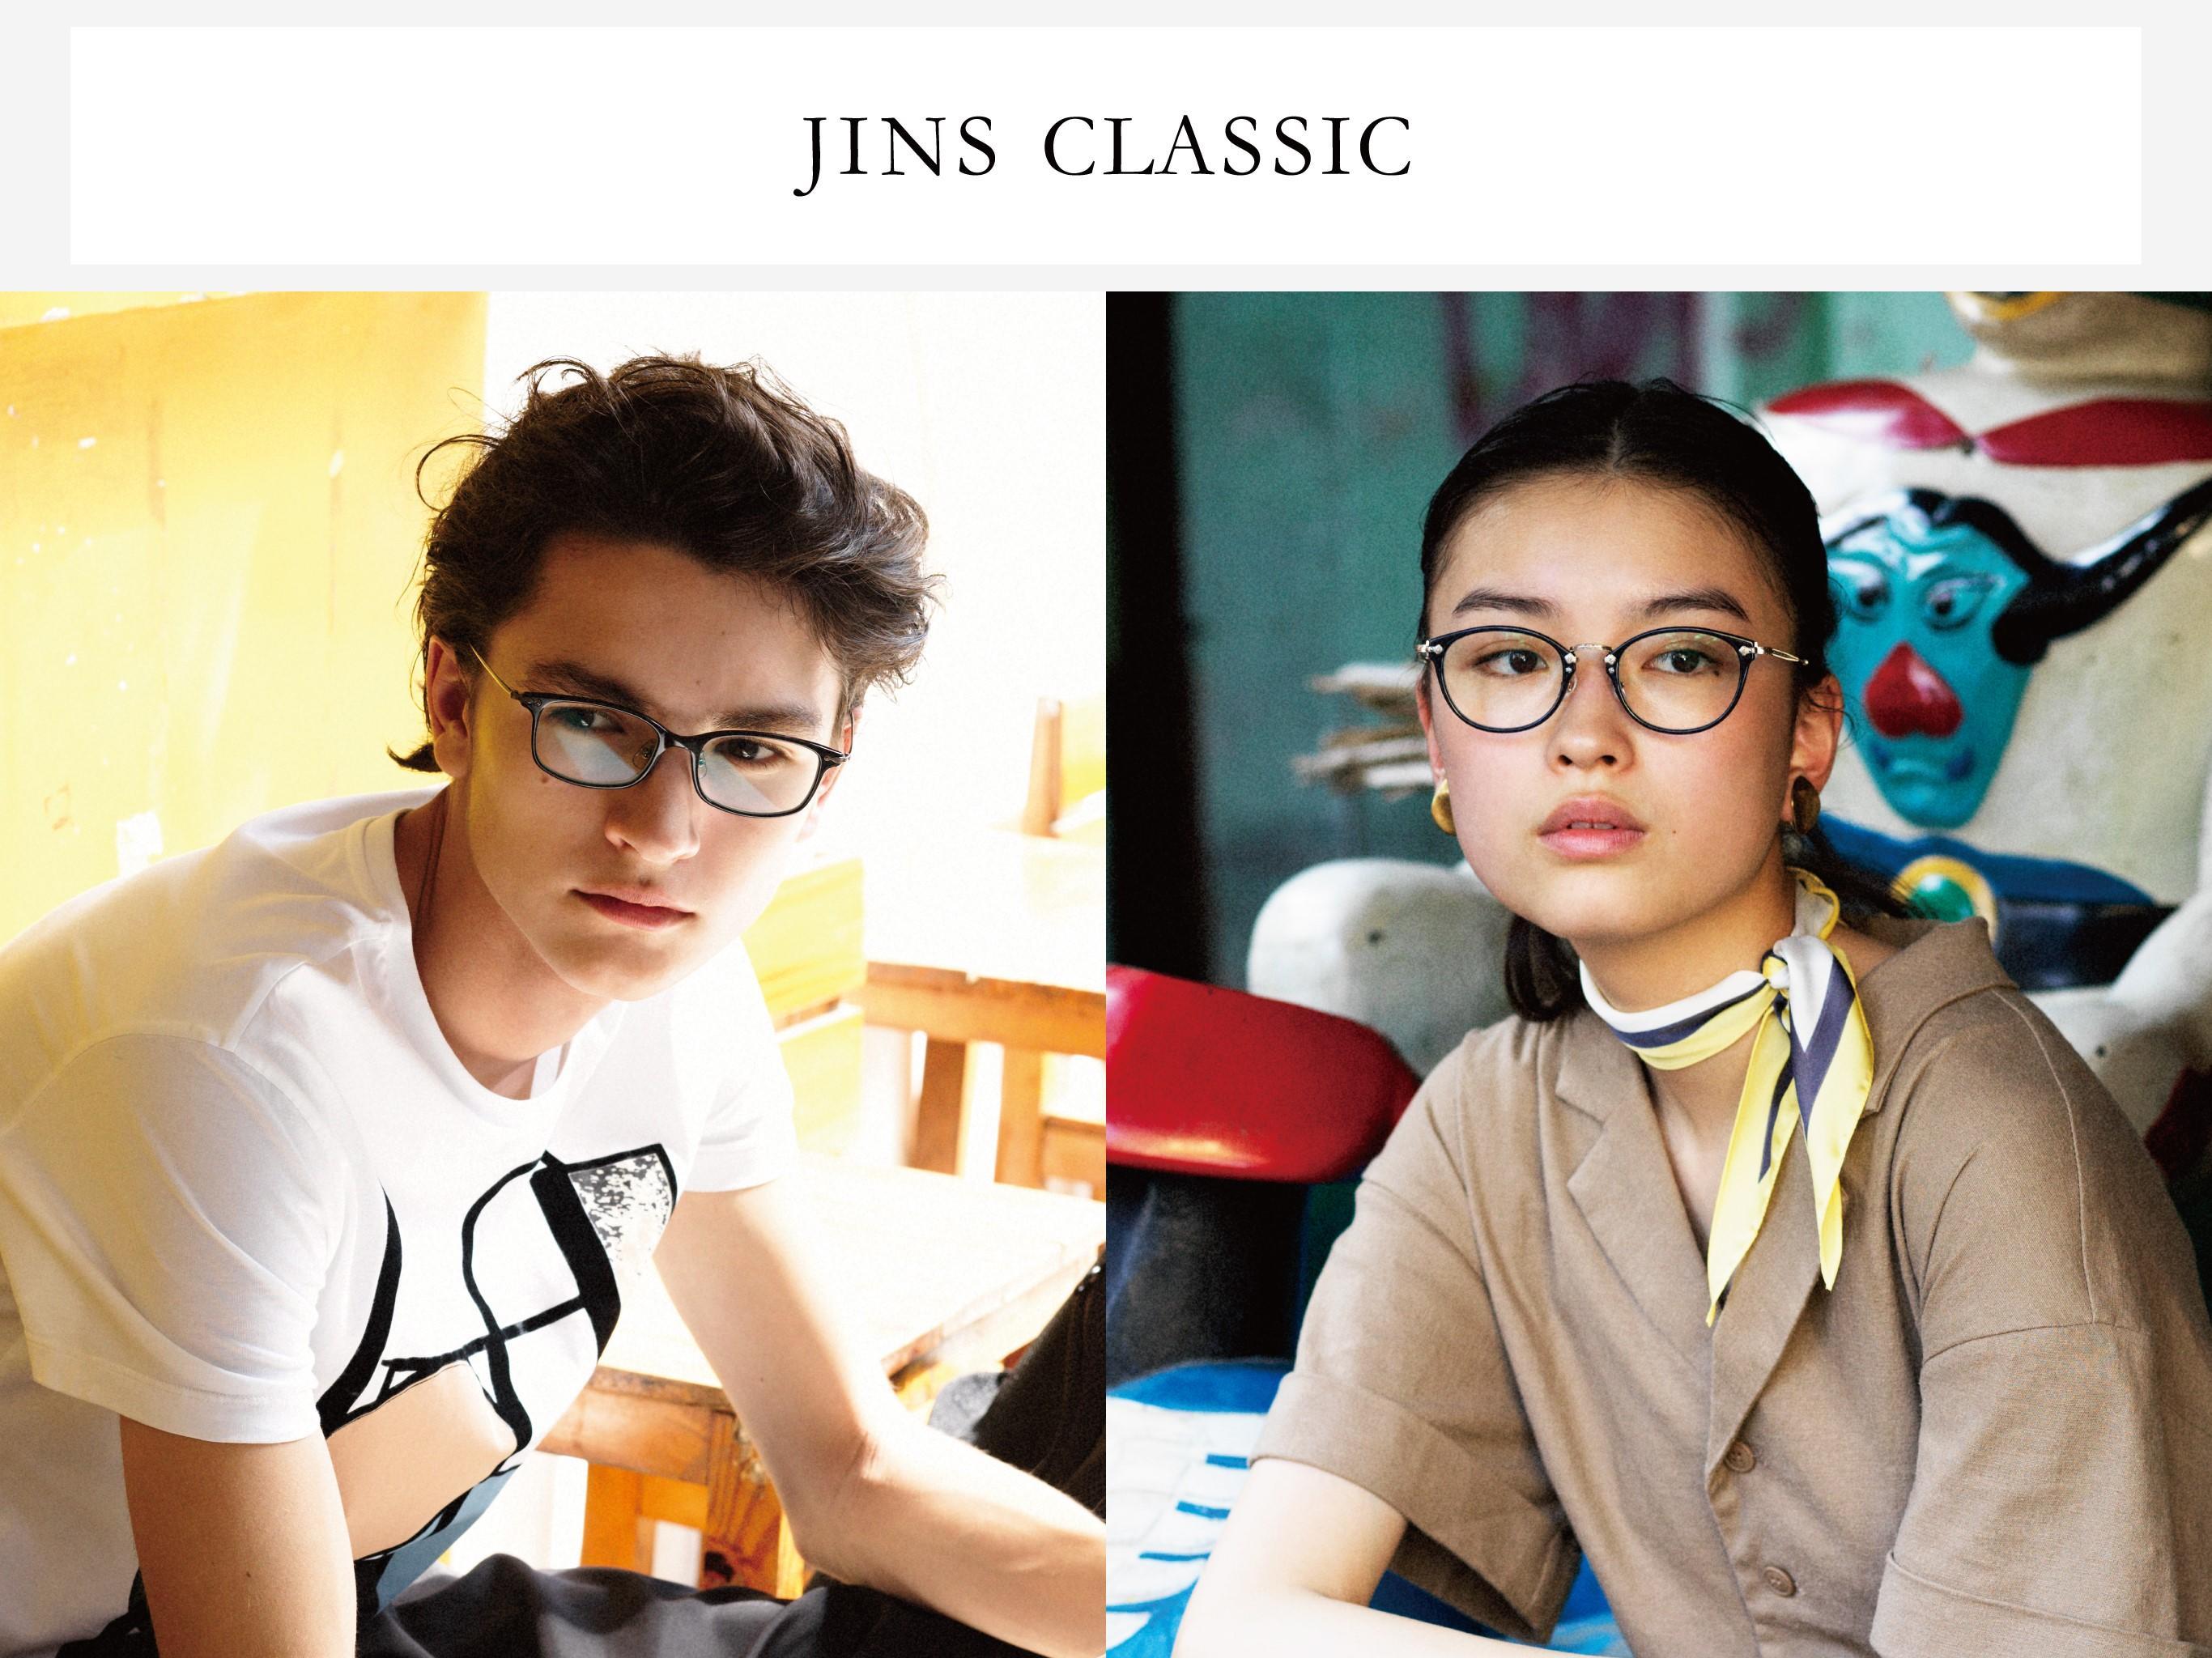 JINS CLASSIC 春の新作!